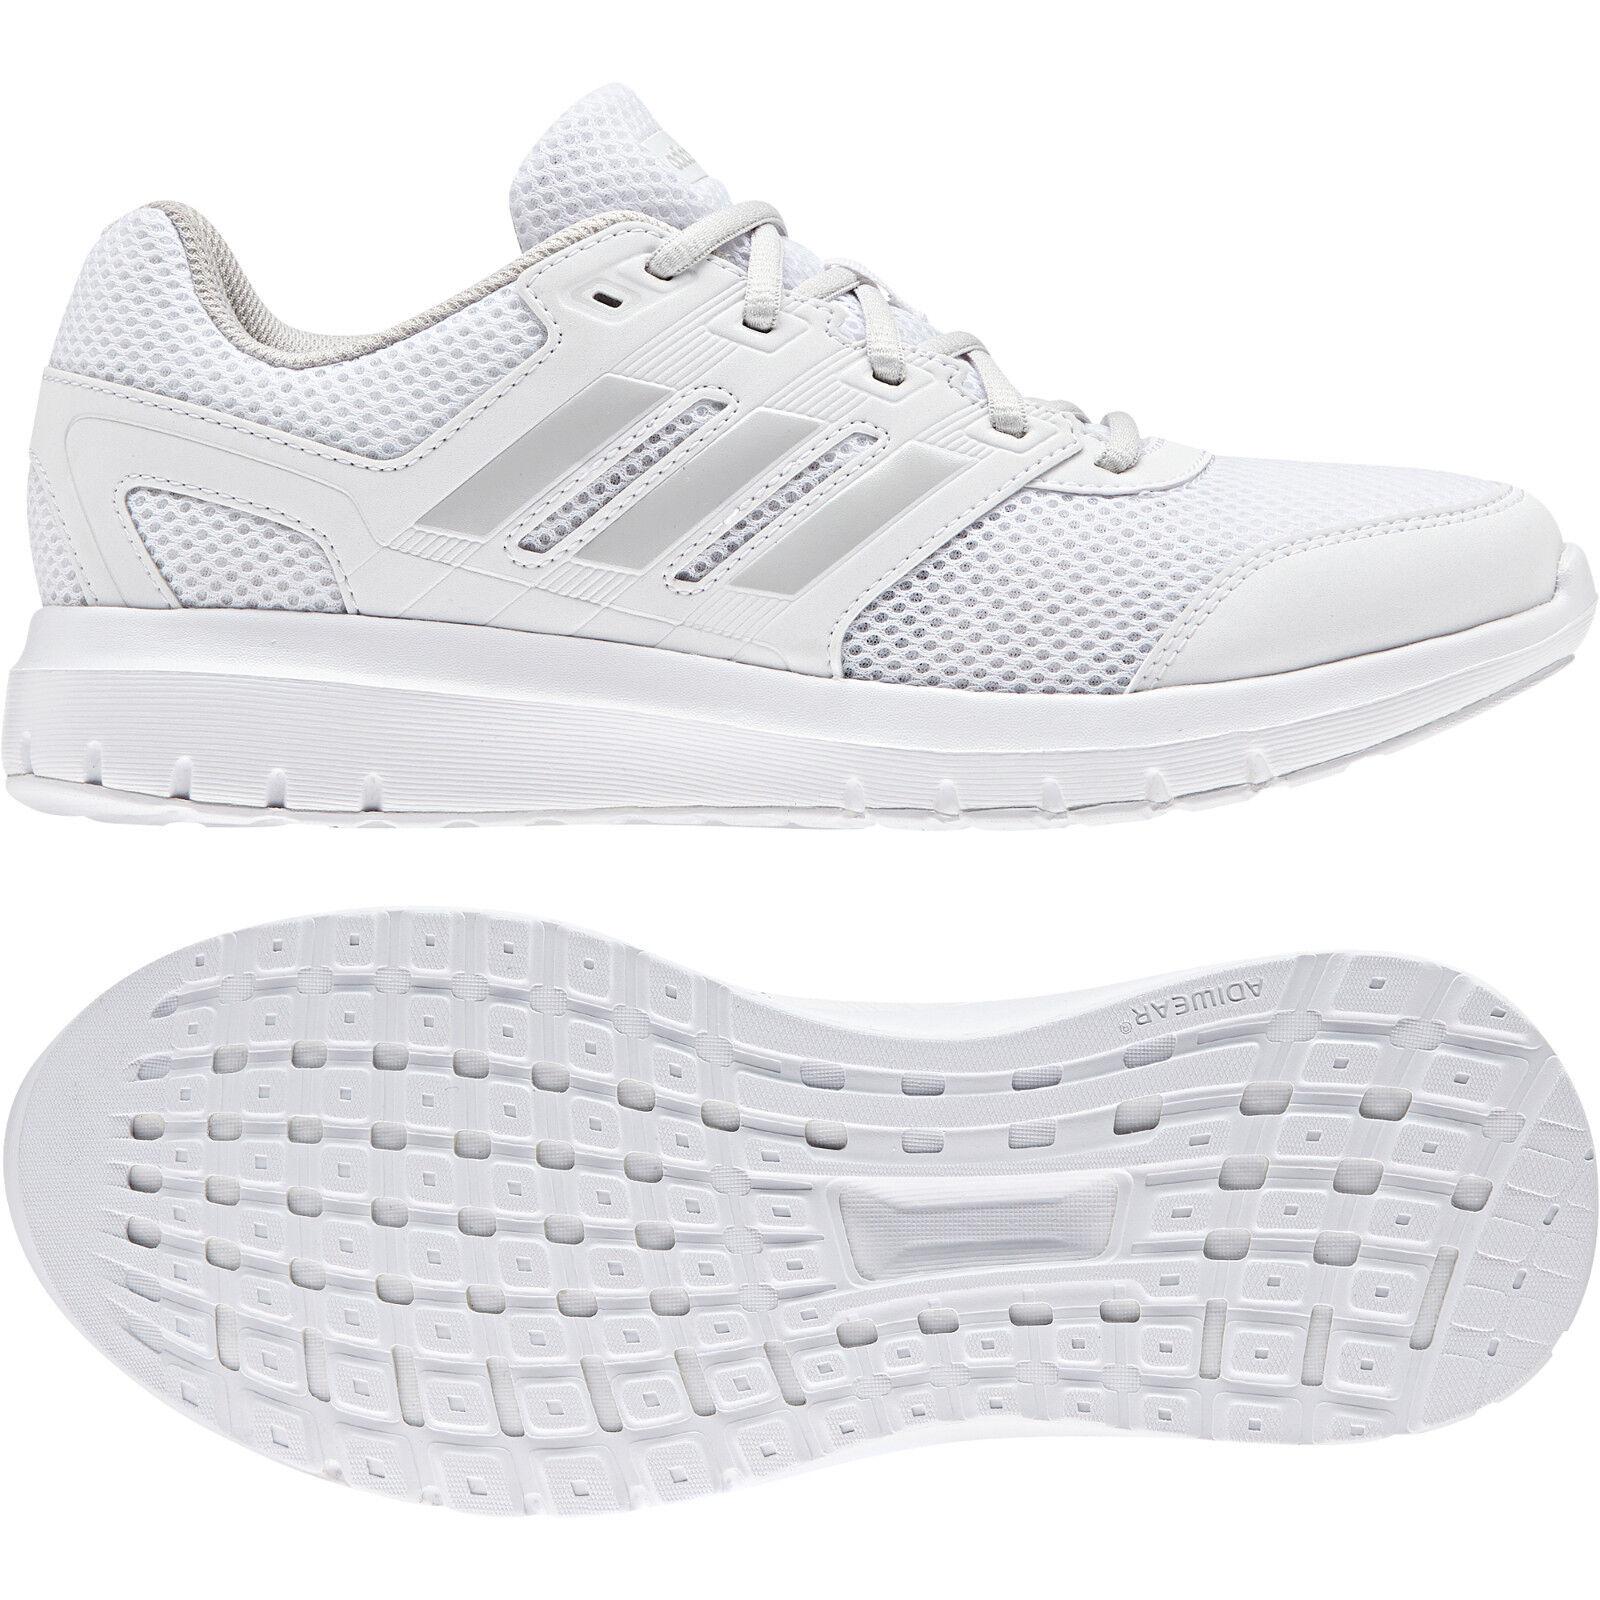 sale retailer 97036 72c8f Adidas damen Running schuhe Duramo Lite 2.0 Training Training Training  Fashion B75587 Fitness Gym ebe748